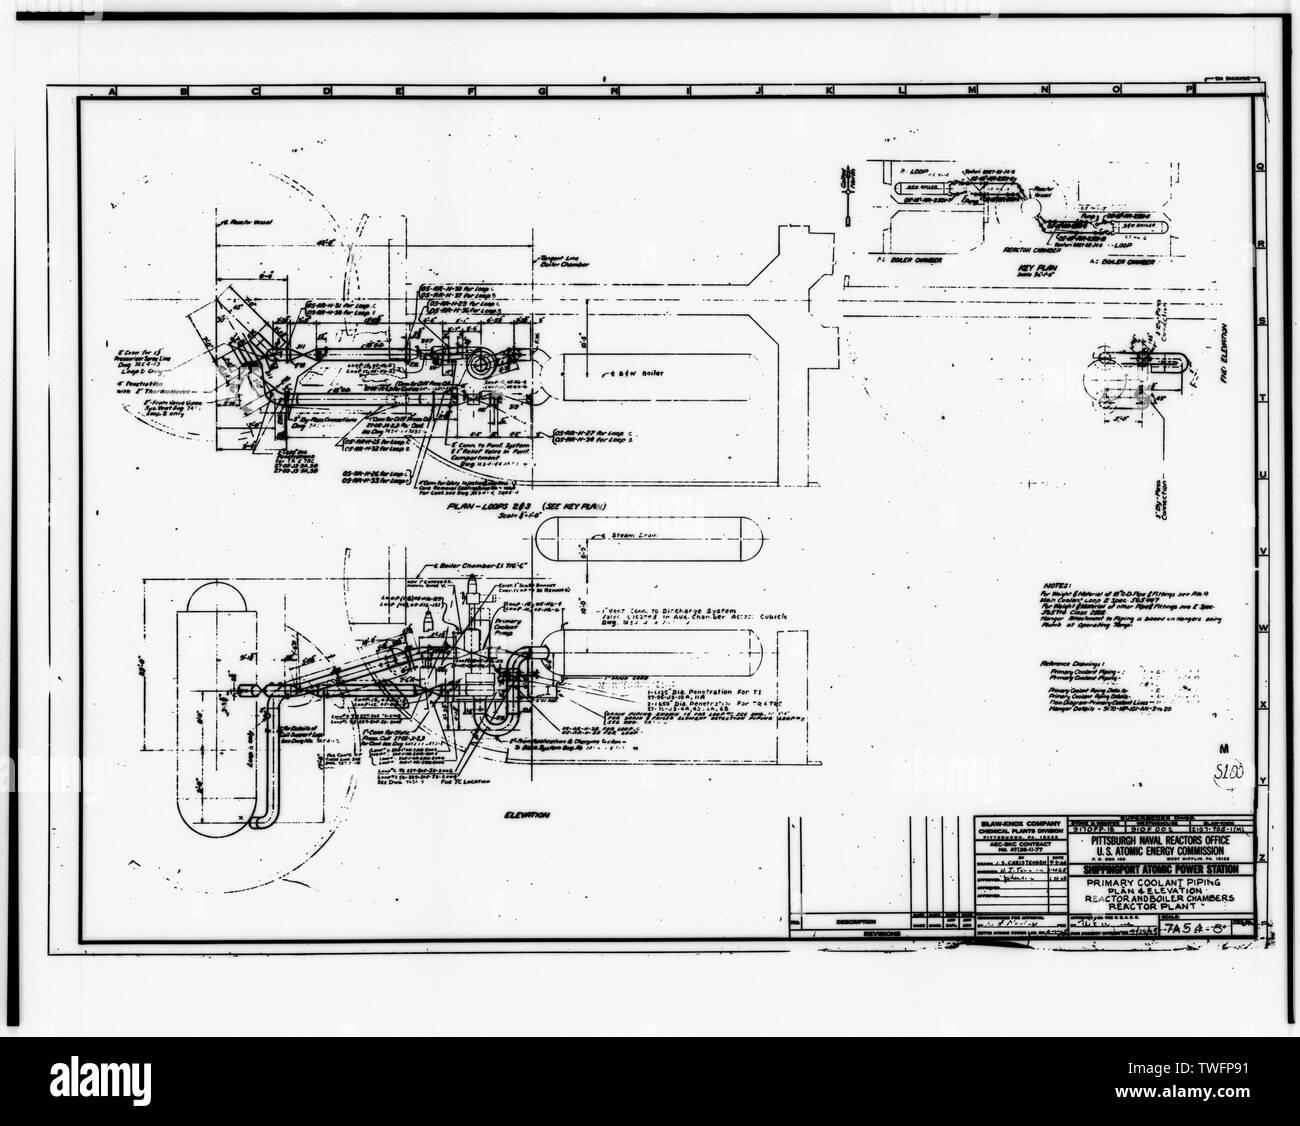 John H Simpson Stockfotos & John H Simpson Bilder - Alamy Oil Burner Wiring Diagram Duquesne on